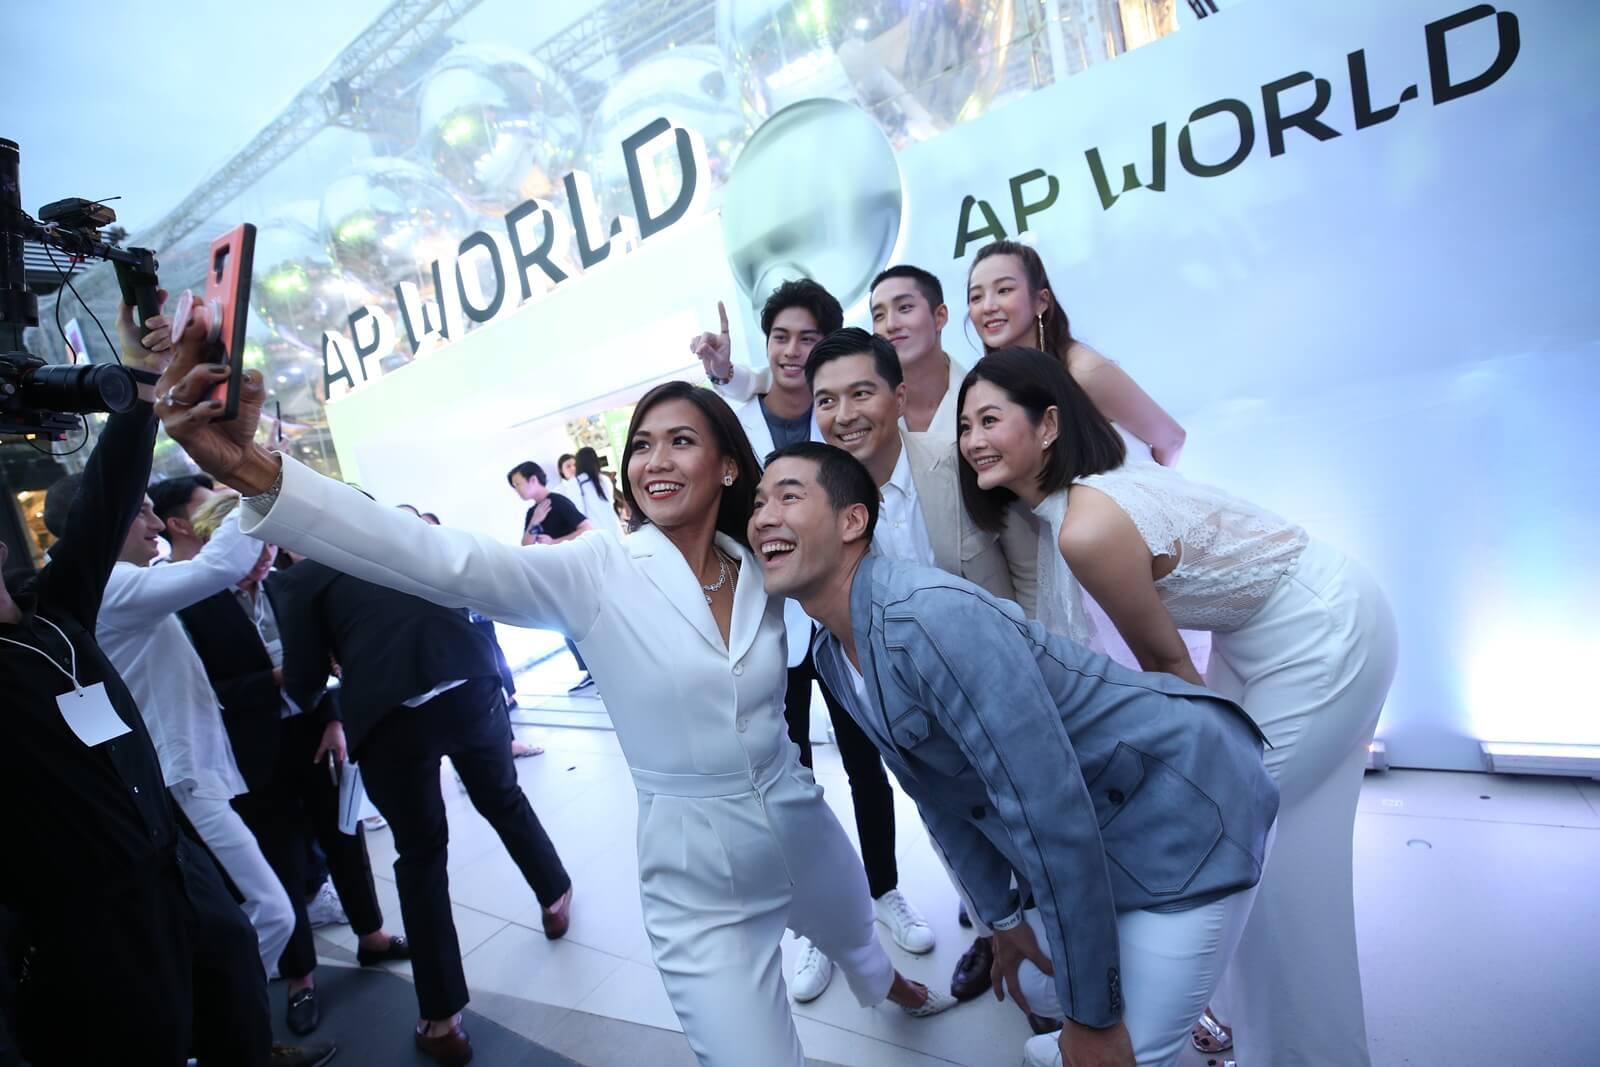 AP World